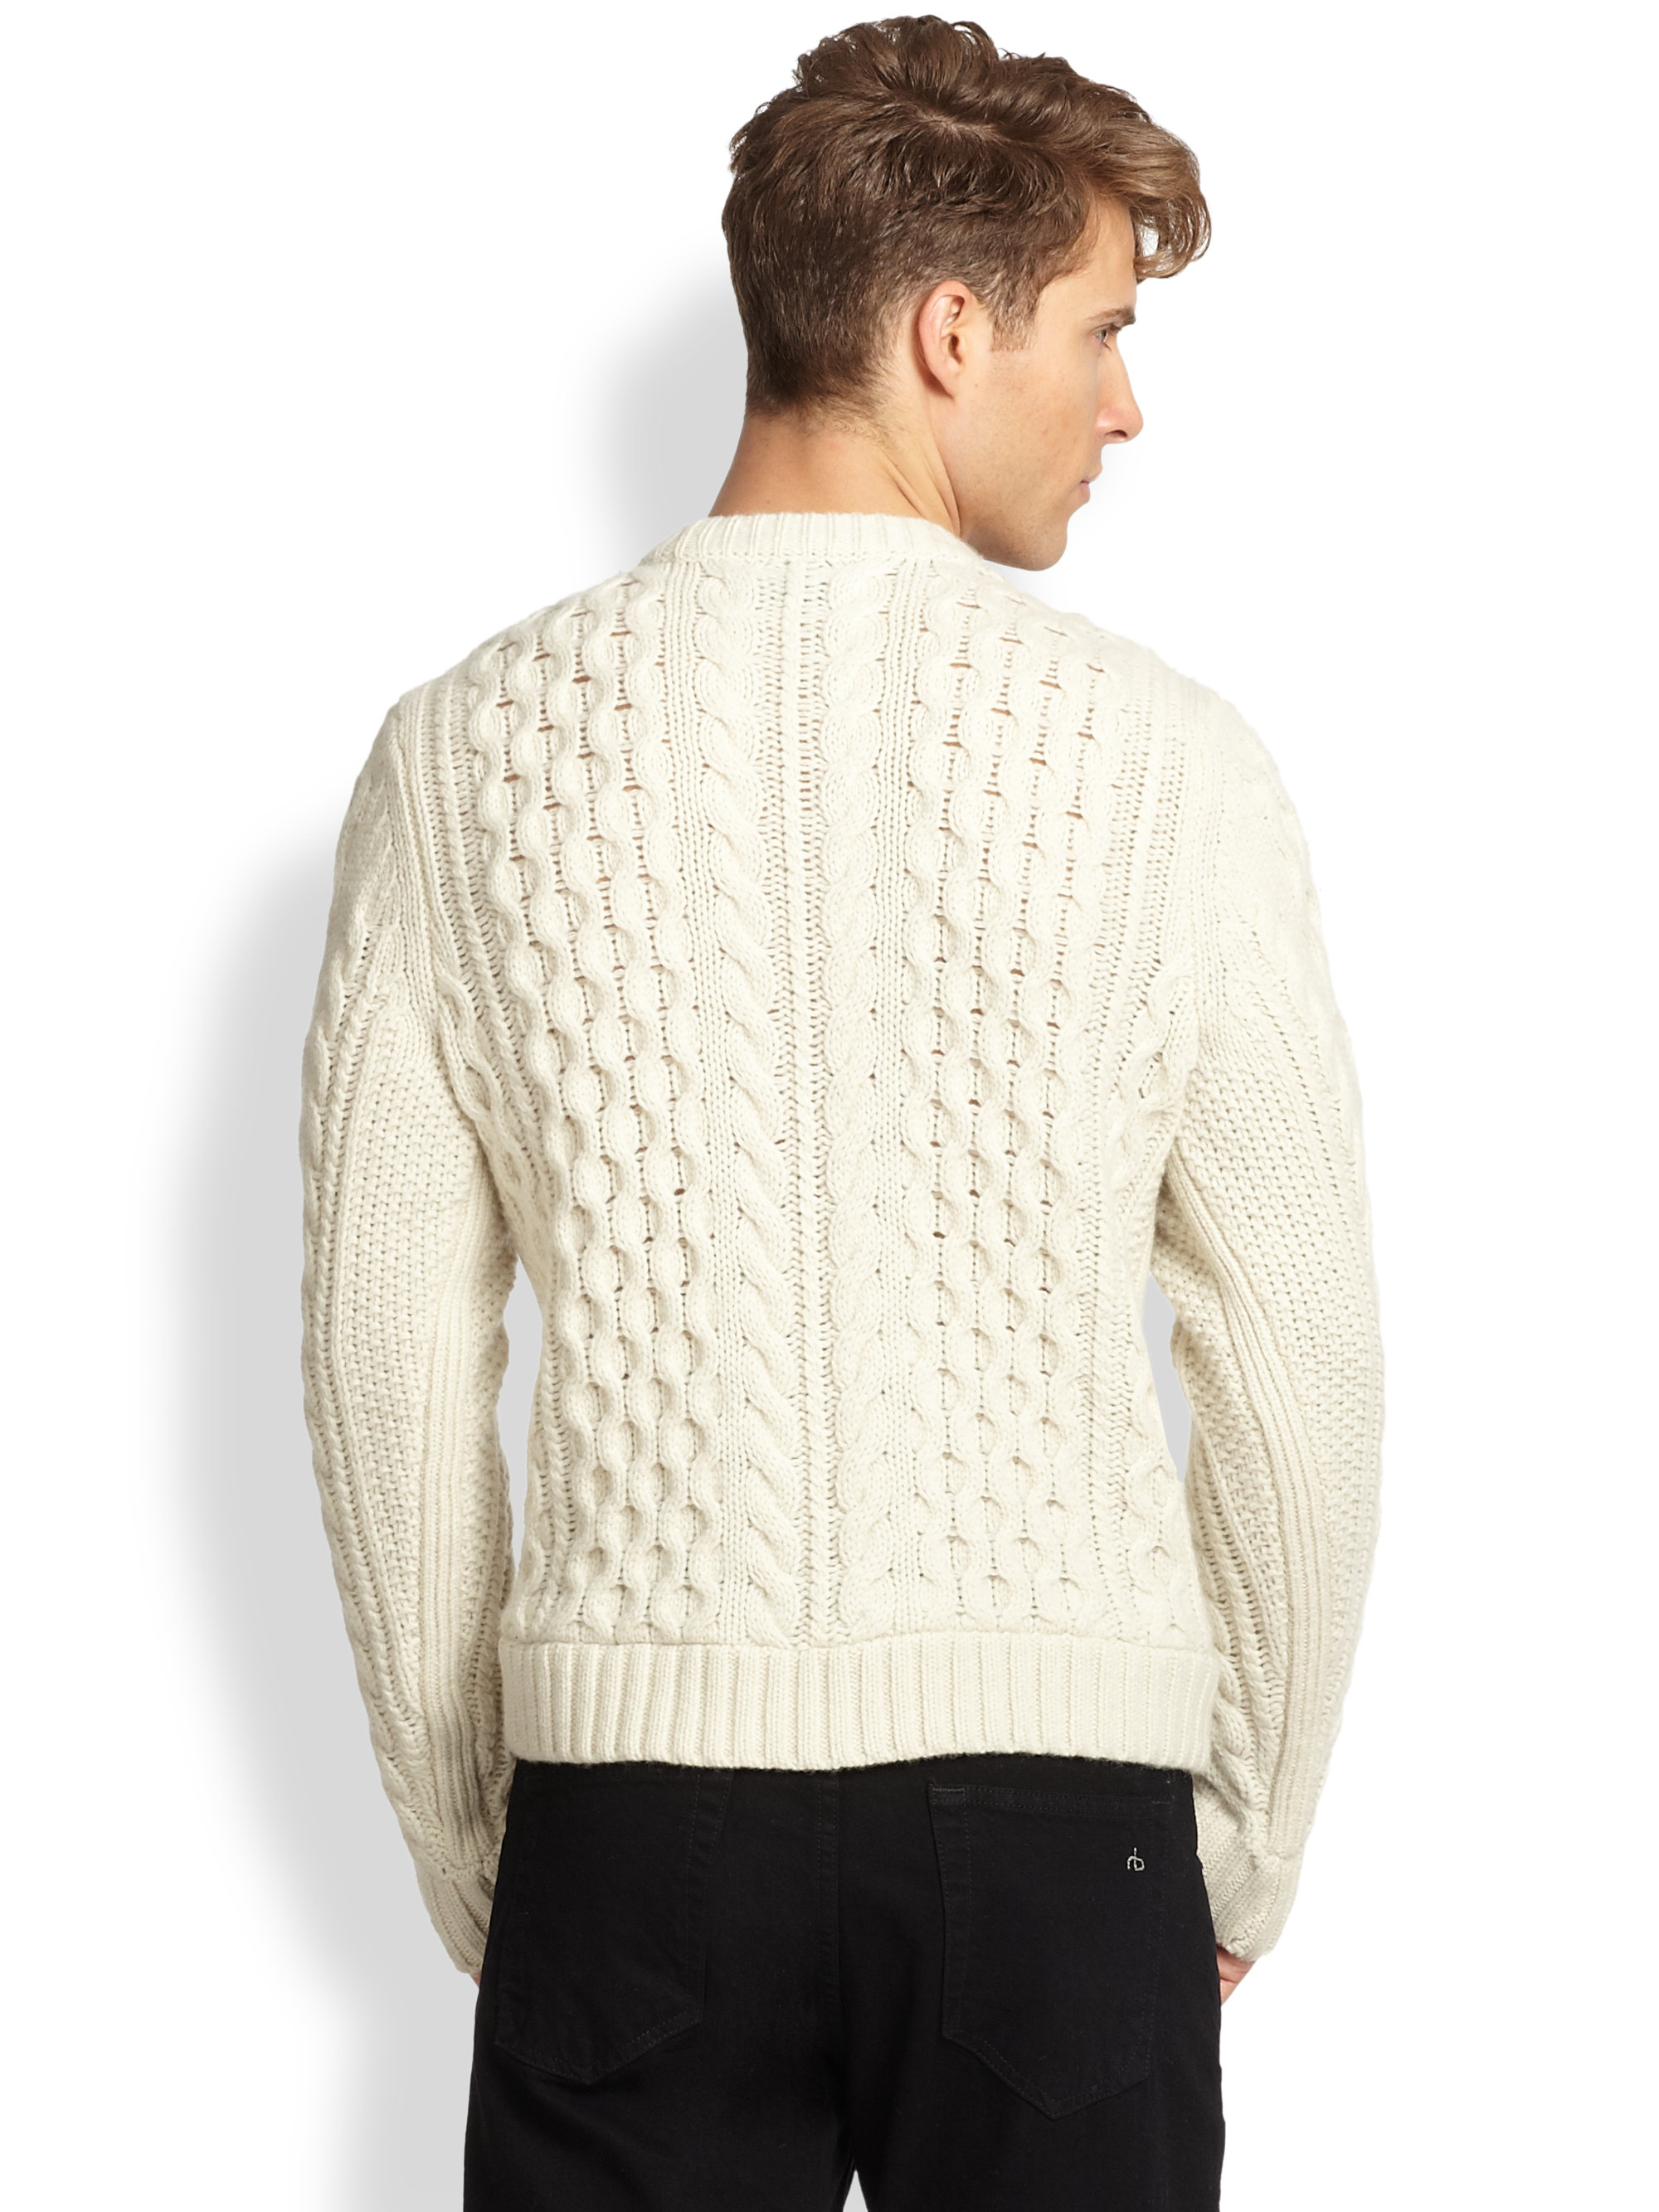 Lyst Rag Bone Trevor Cable Knit Wool Sweater In White For Men